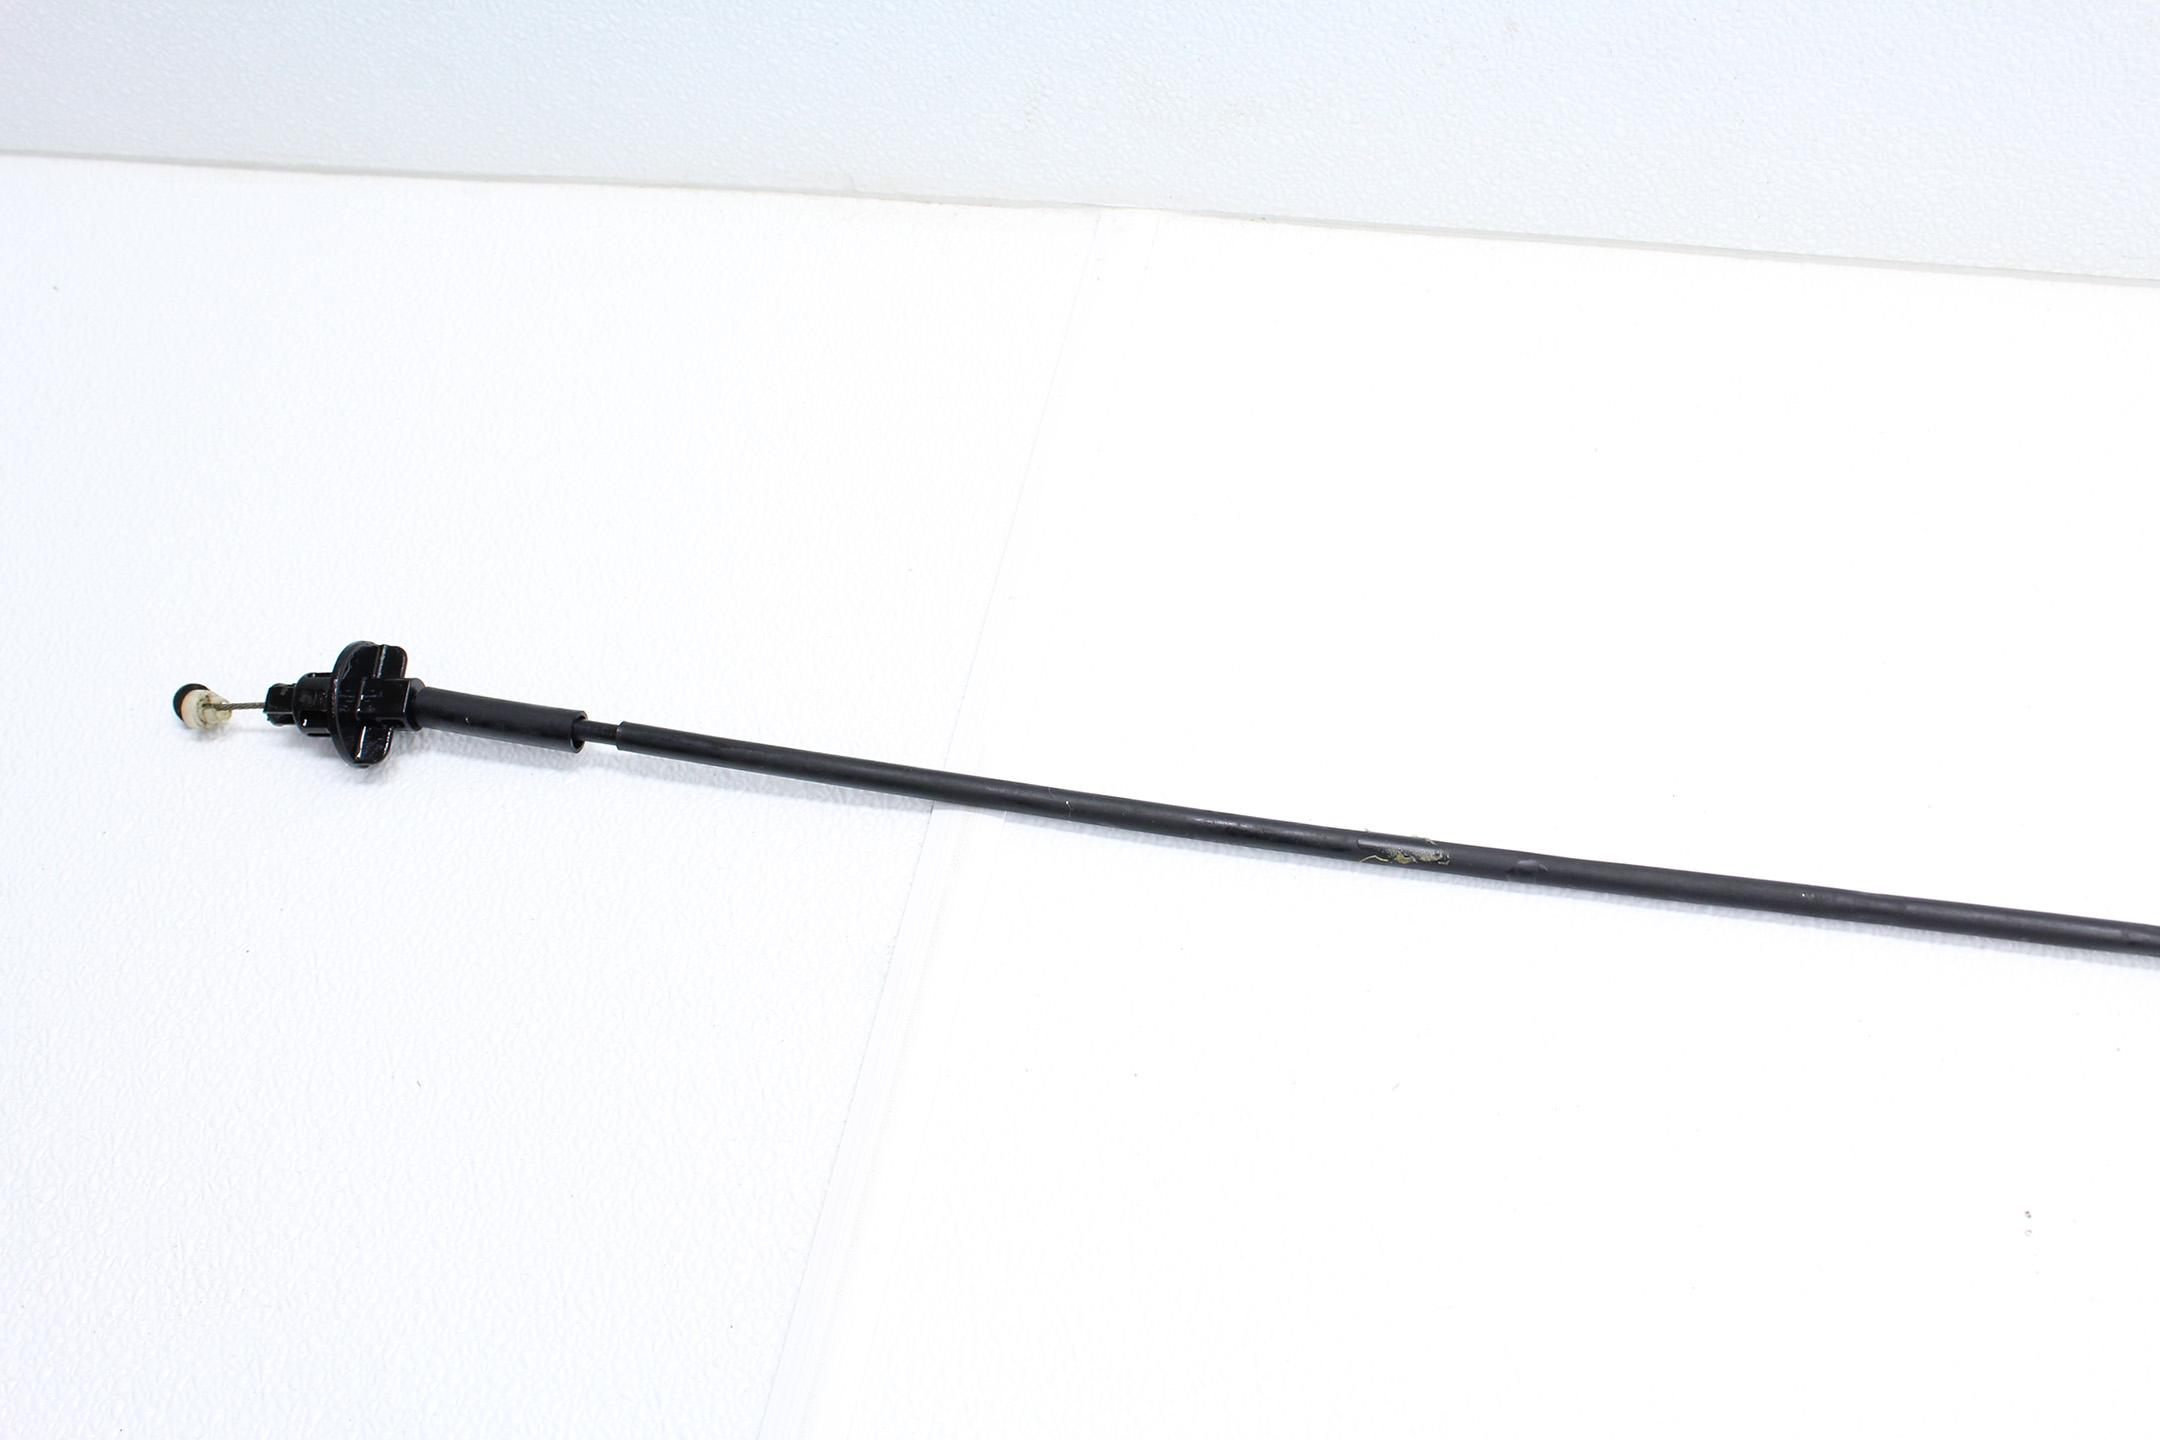 Subaru Impreza 2 5 Rs Gc8 Throttle Cable Drive